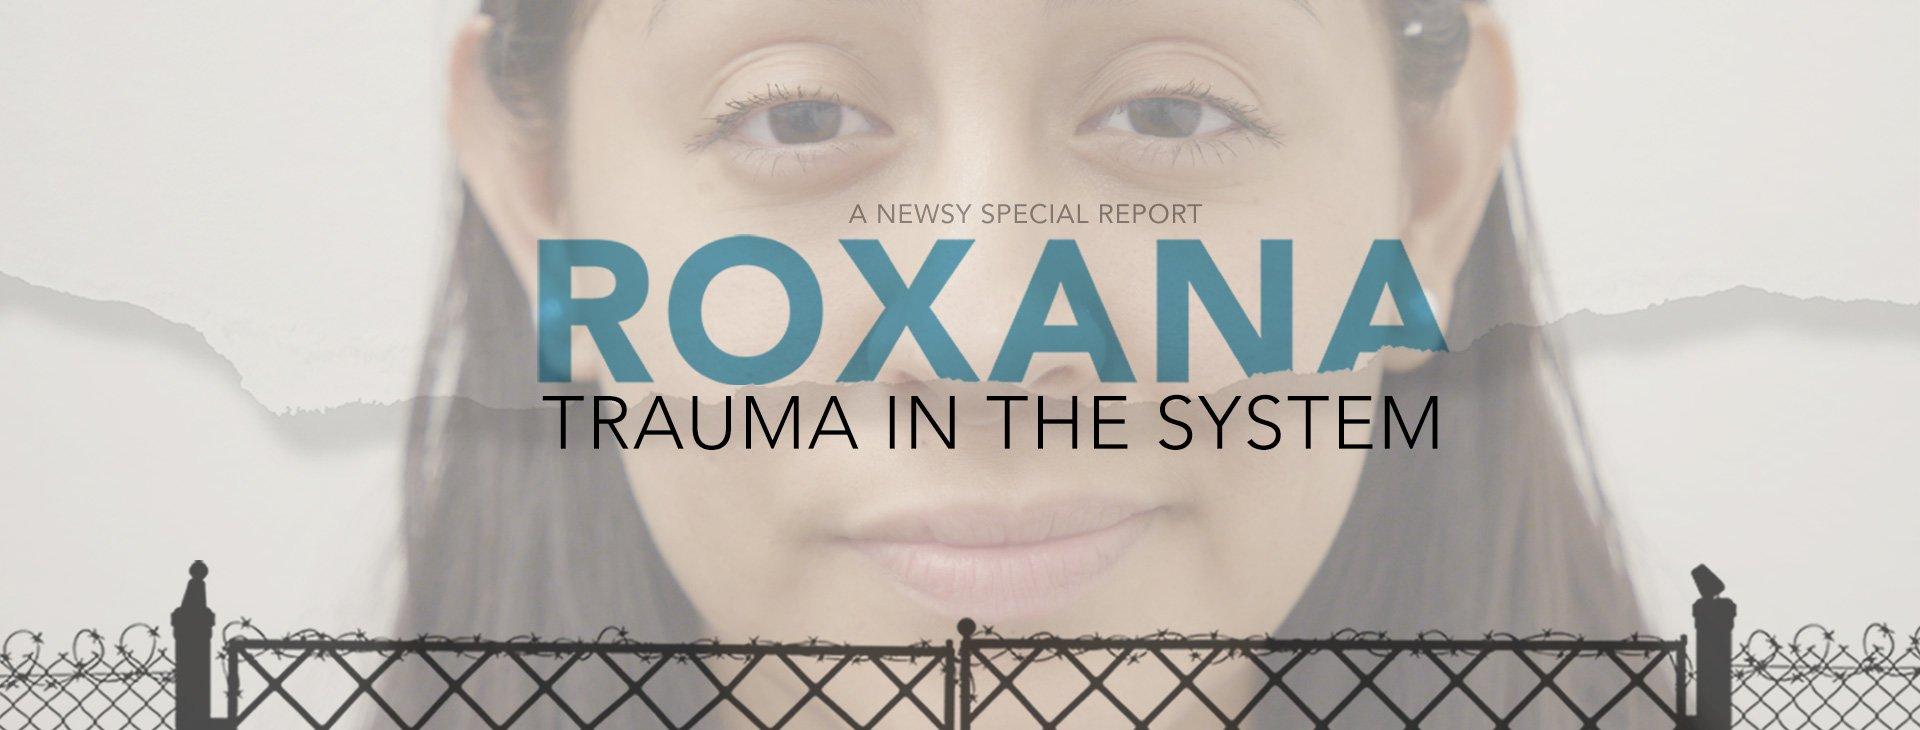 Roxana: Trauma in the System